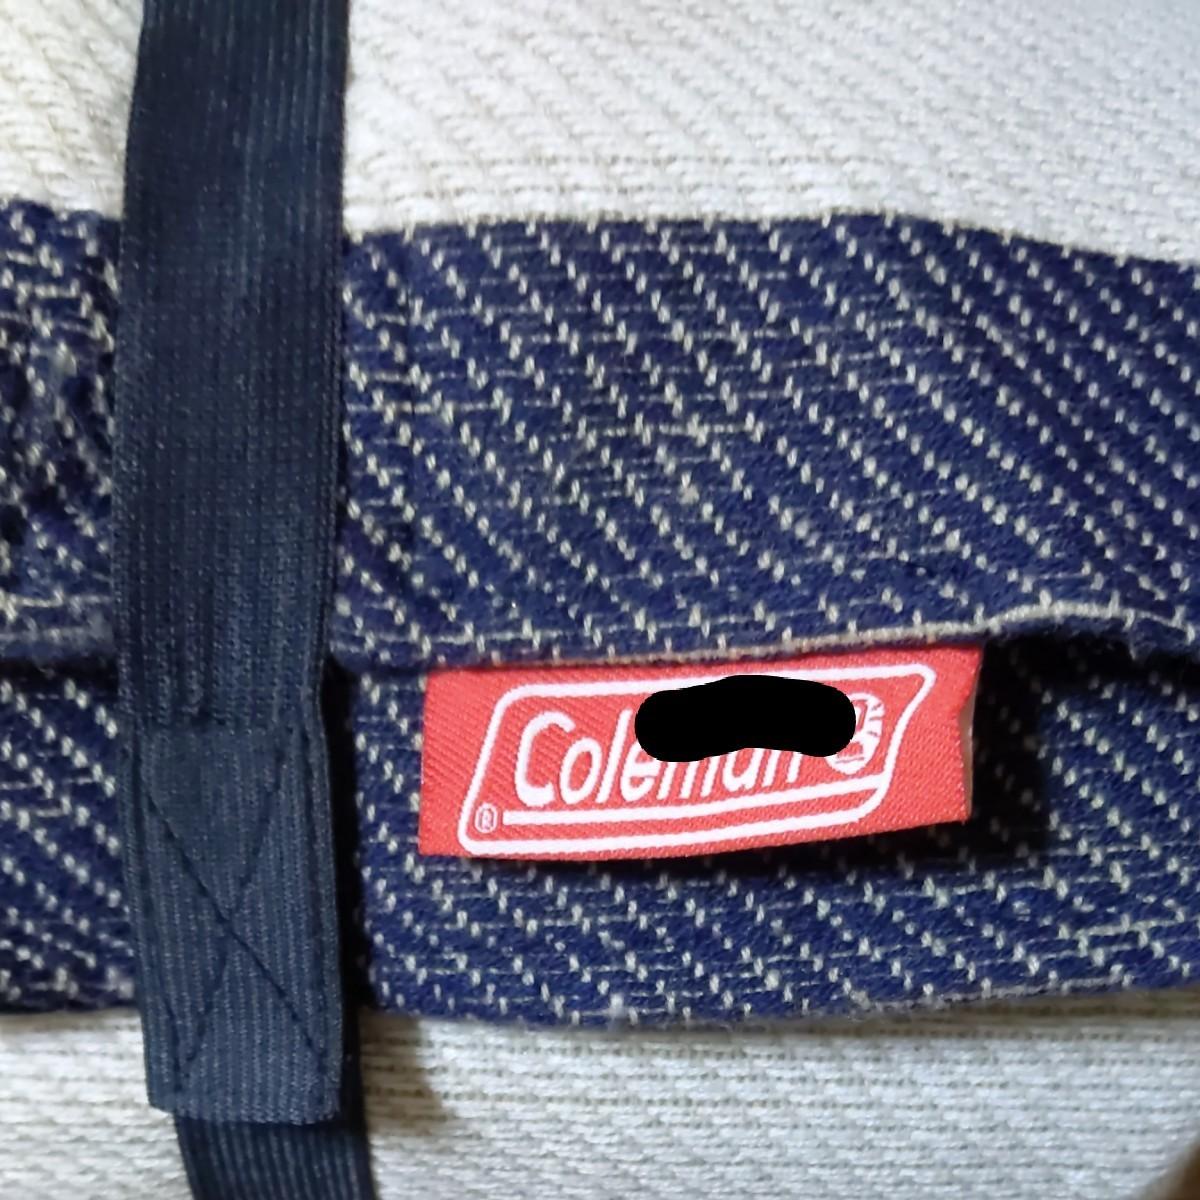 Coleman(コールマン)レジャーシート ネイビー×ホワイト 太ボーダー インナーシート 持ち手付 クッション性 記名有り